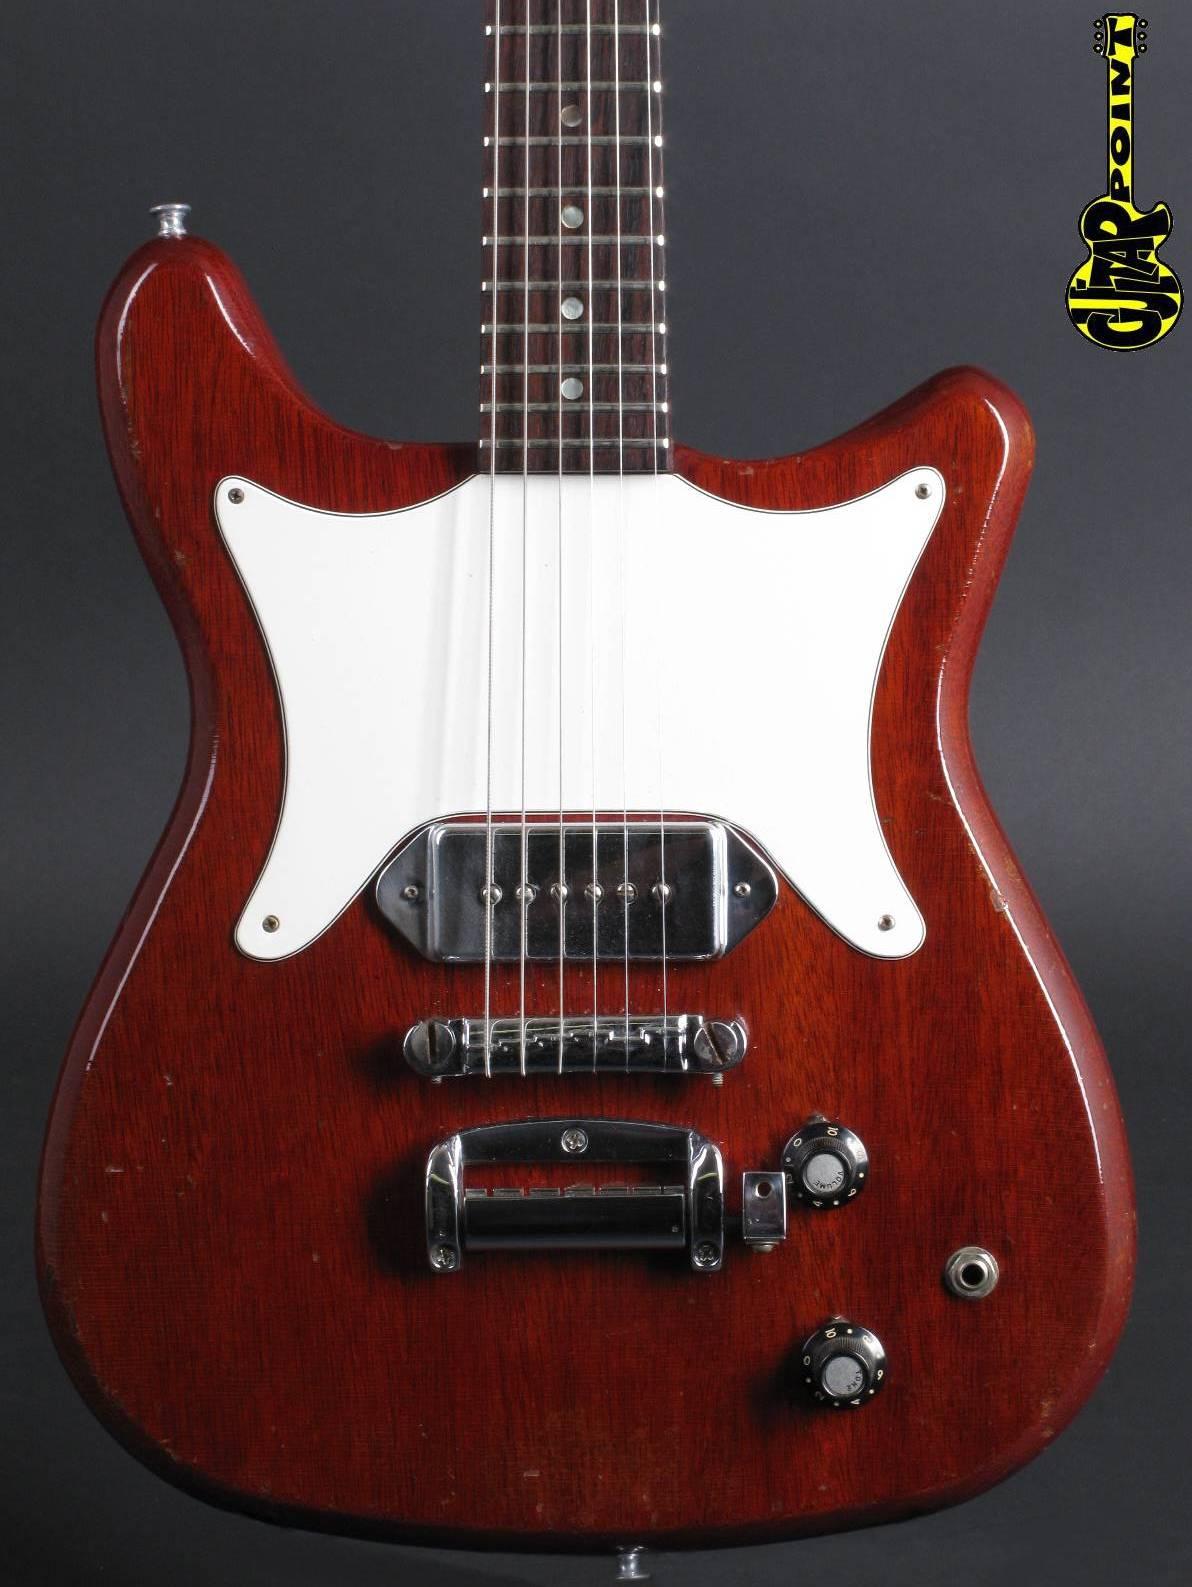 1966 Epiphone Coronet - Cherry